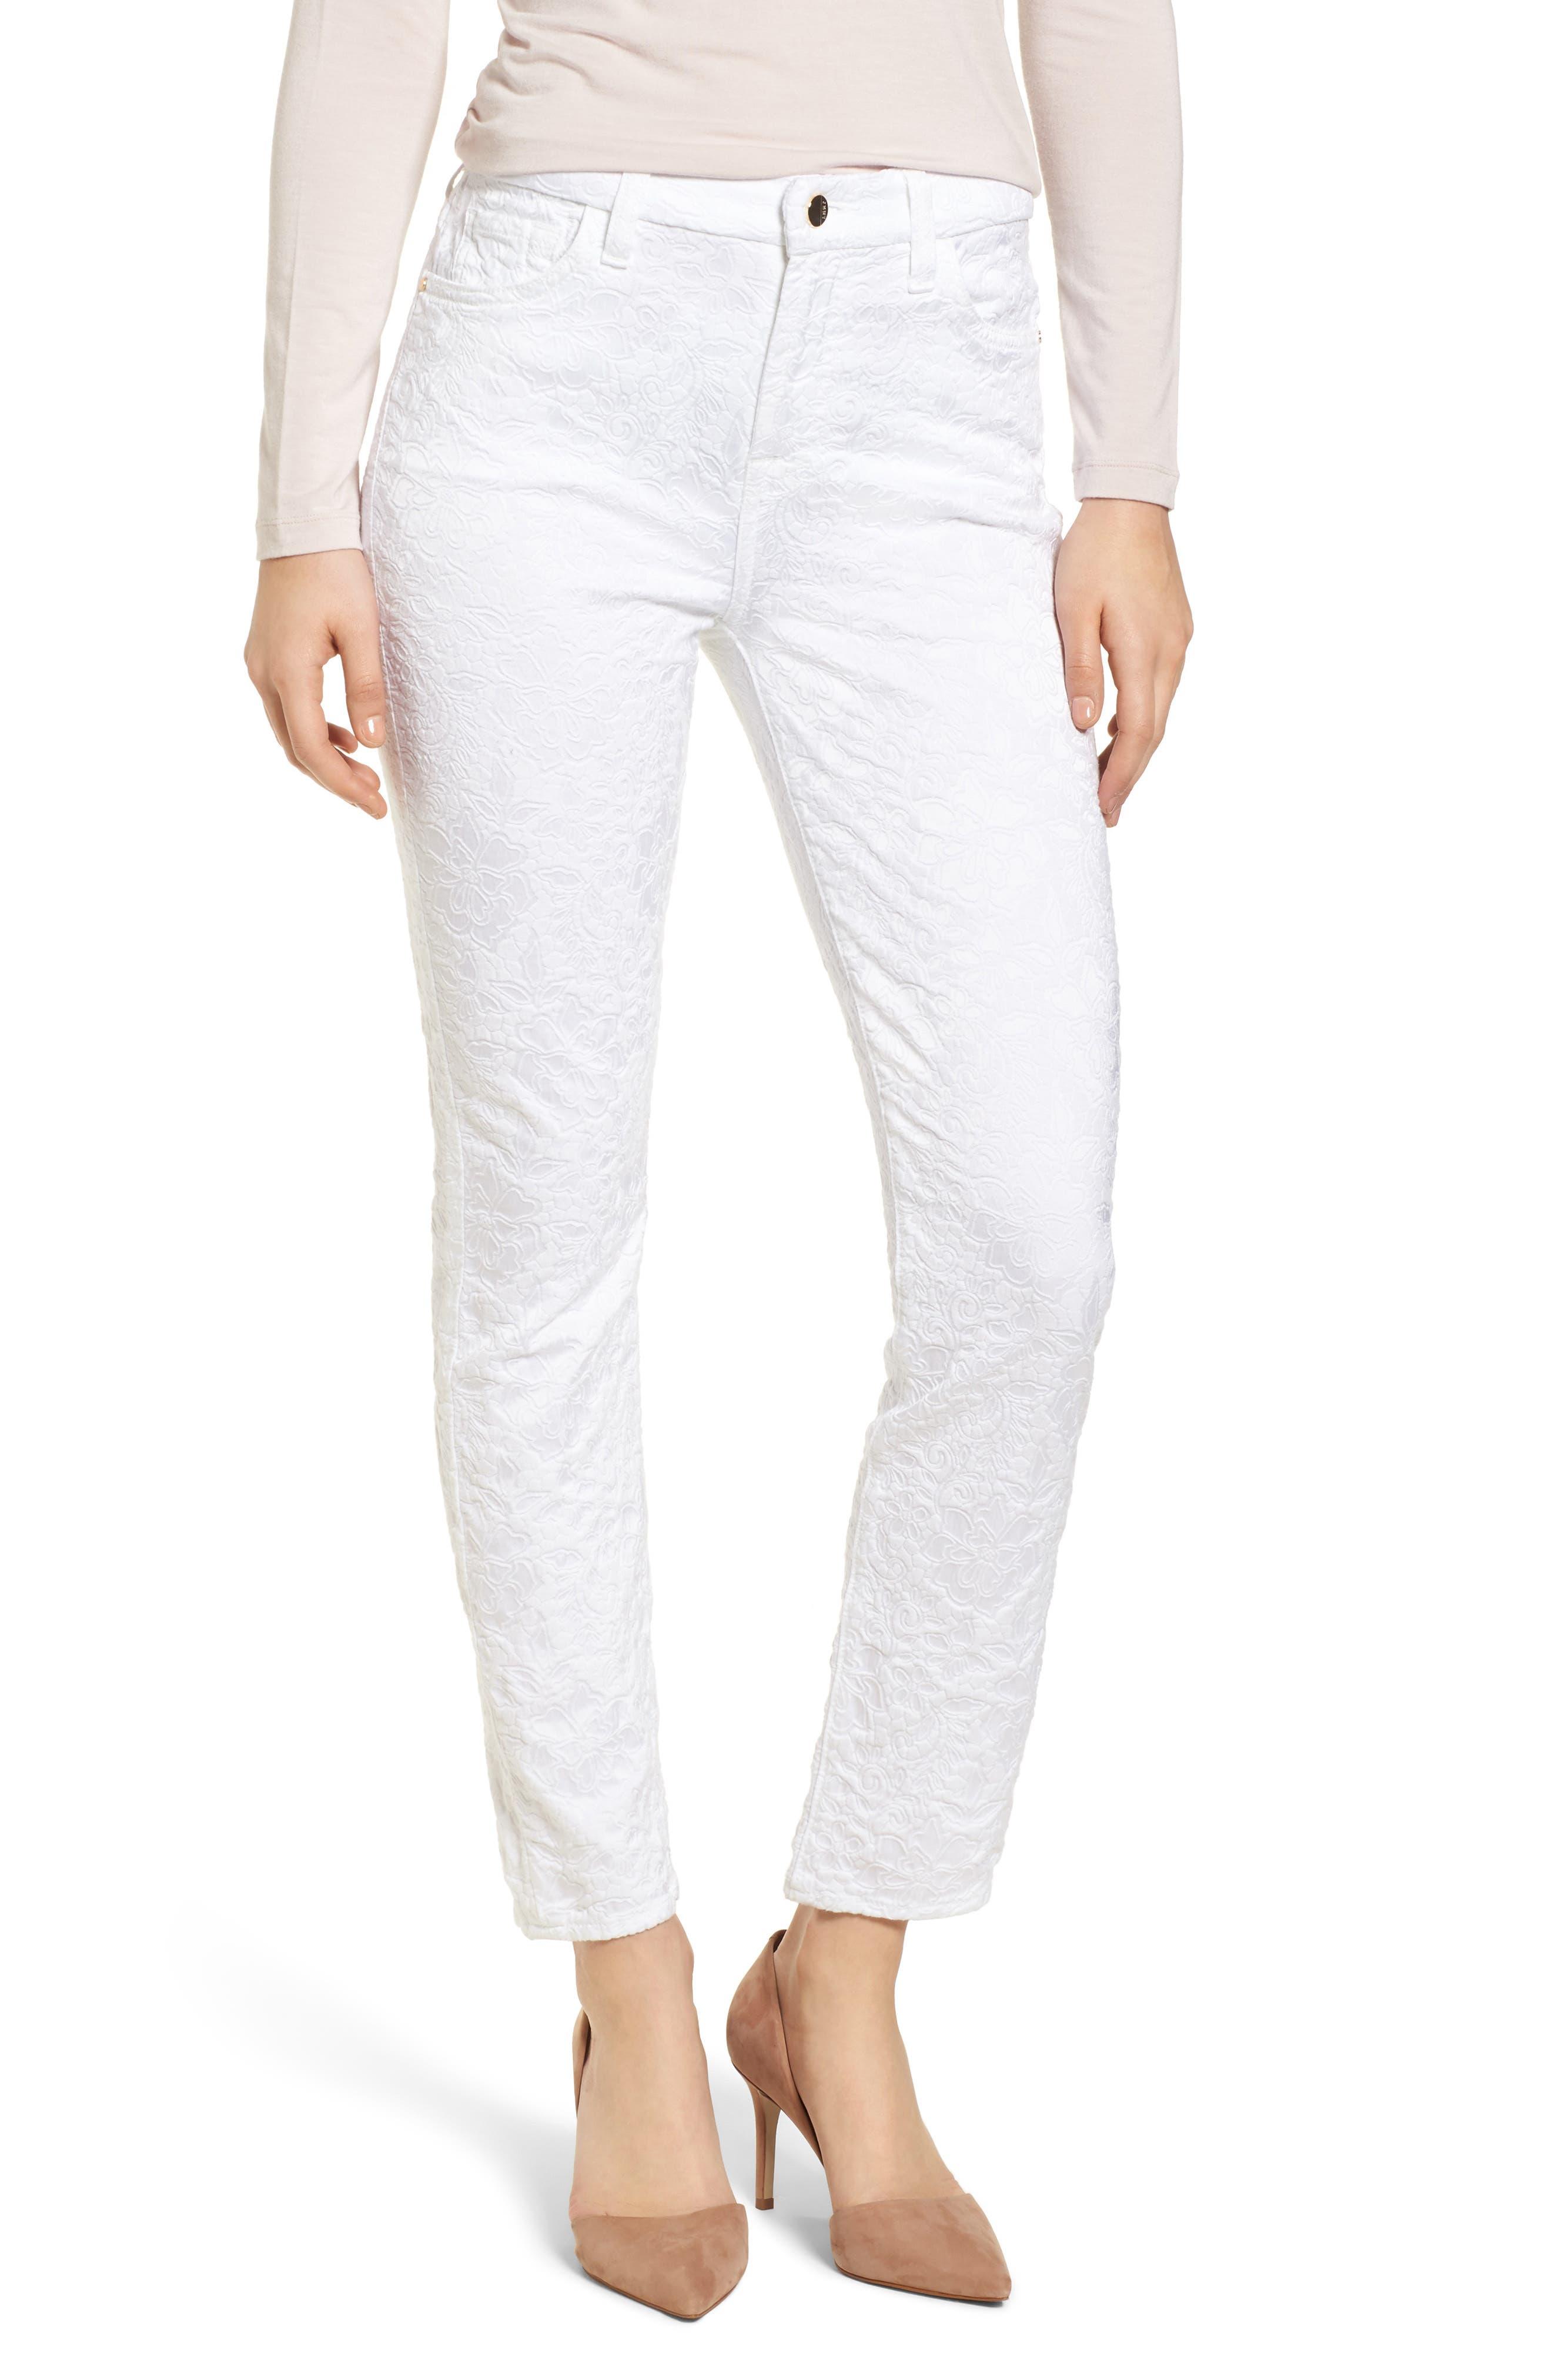 Jacquard Ankle Skinny Jeans,                             Main thumbnail 1, color,                             White